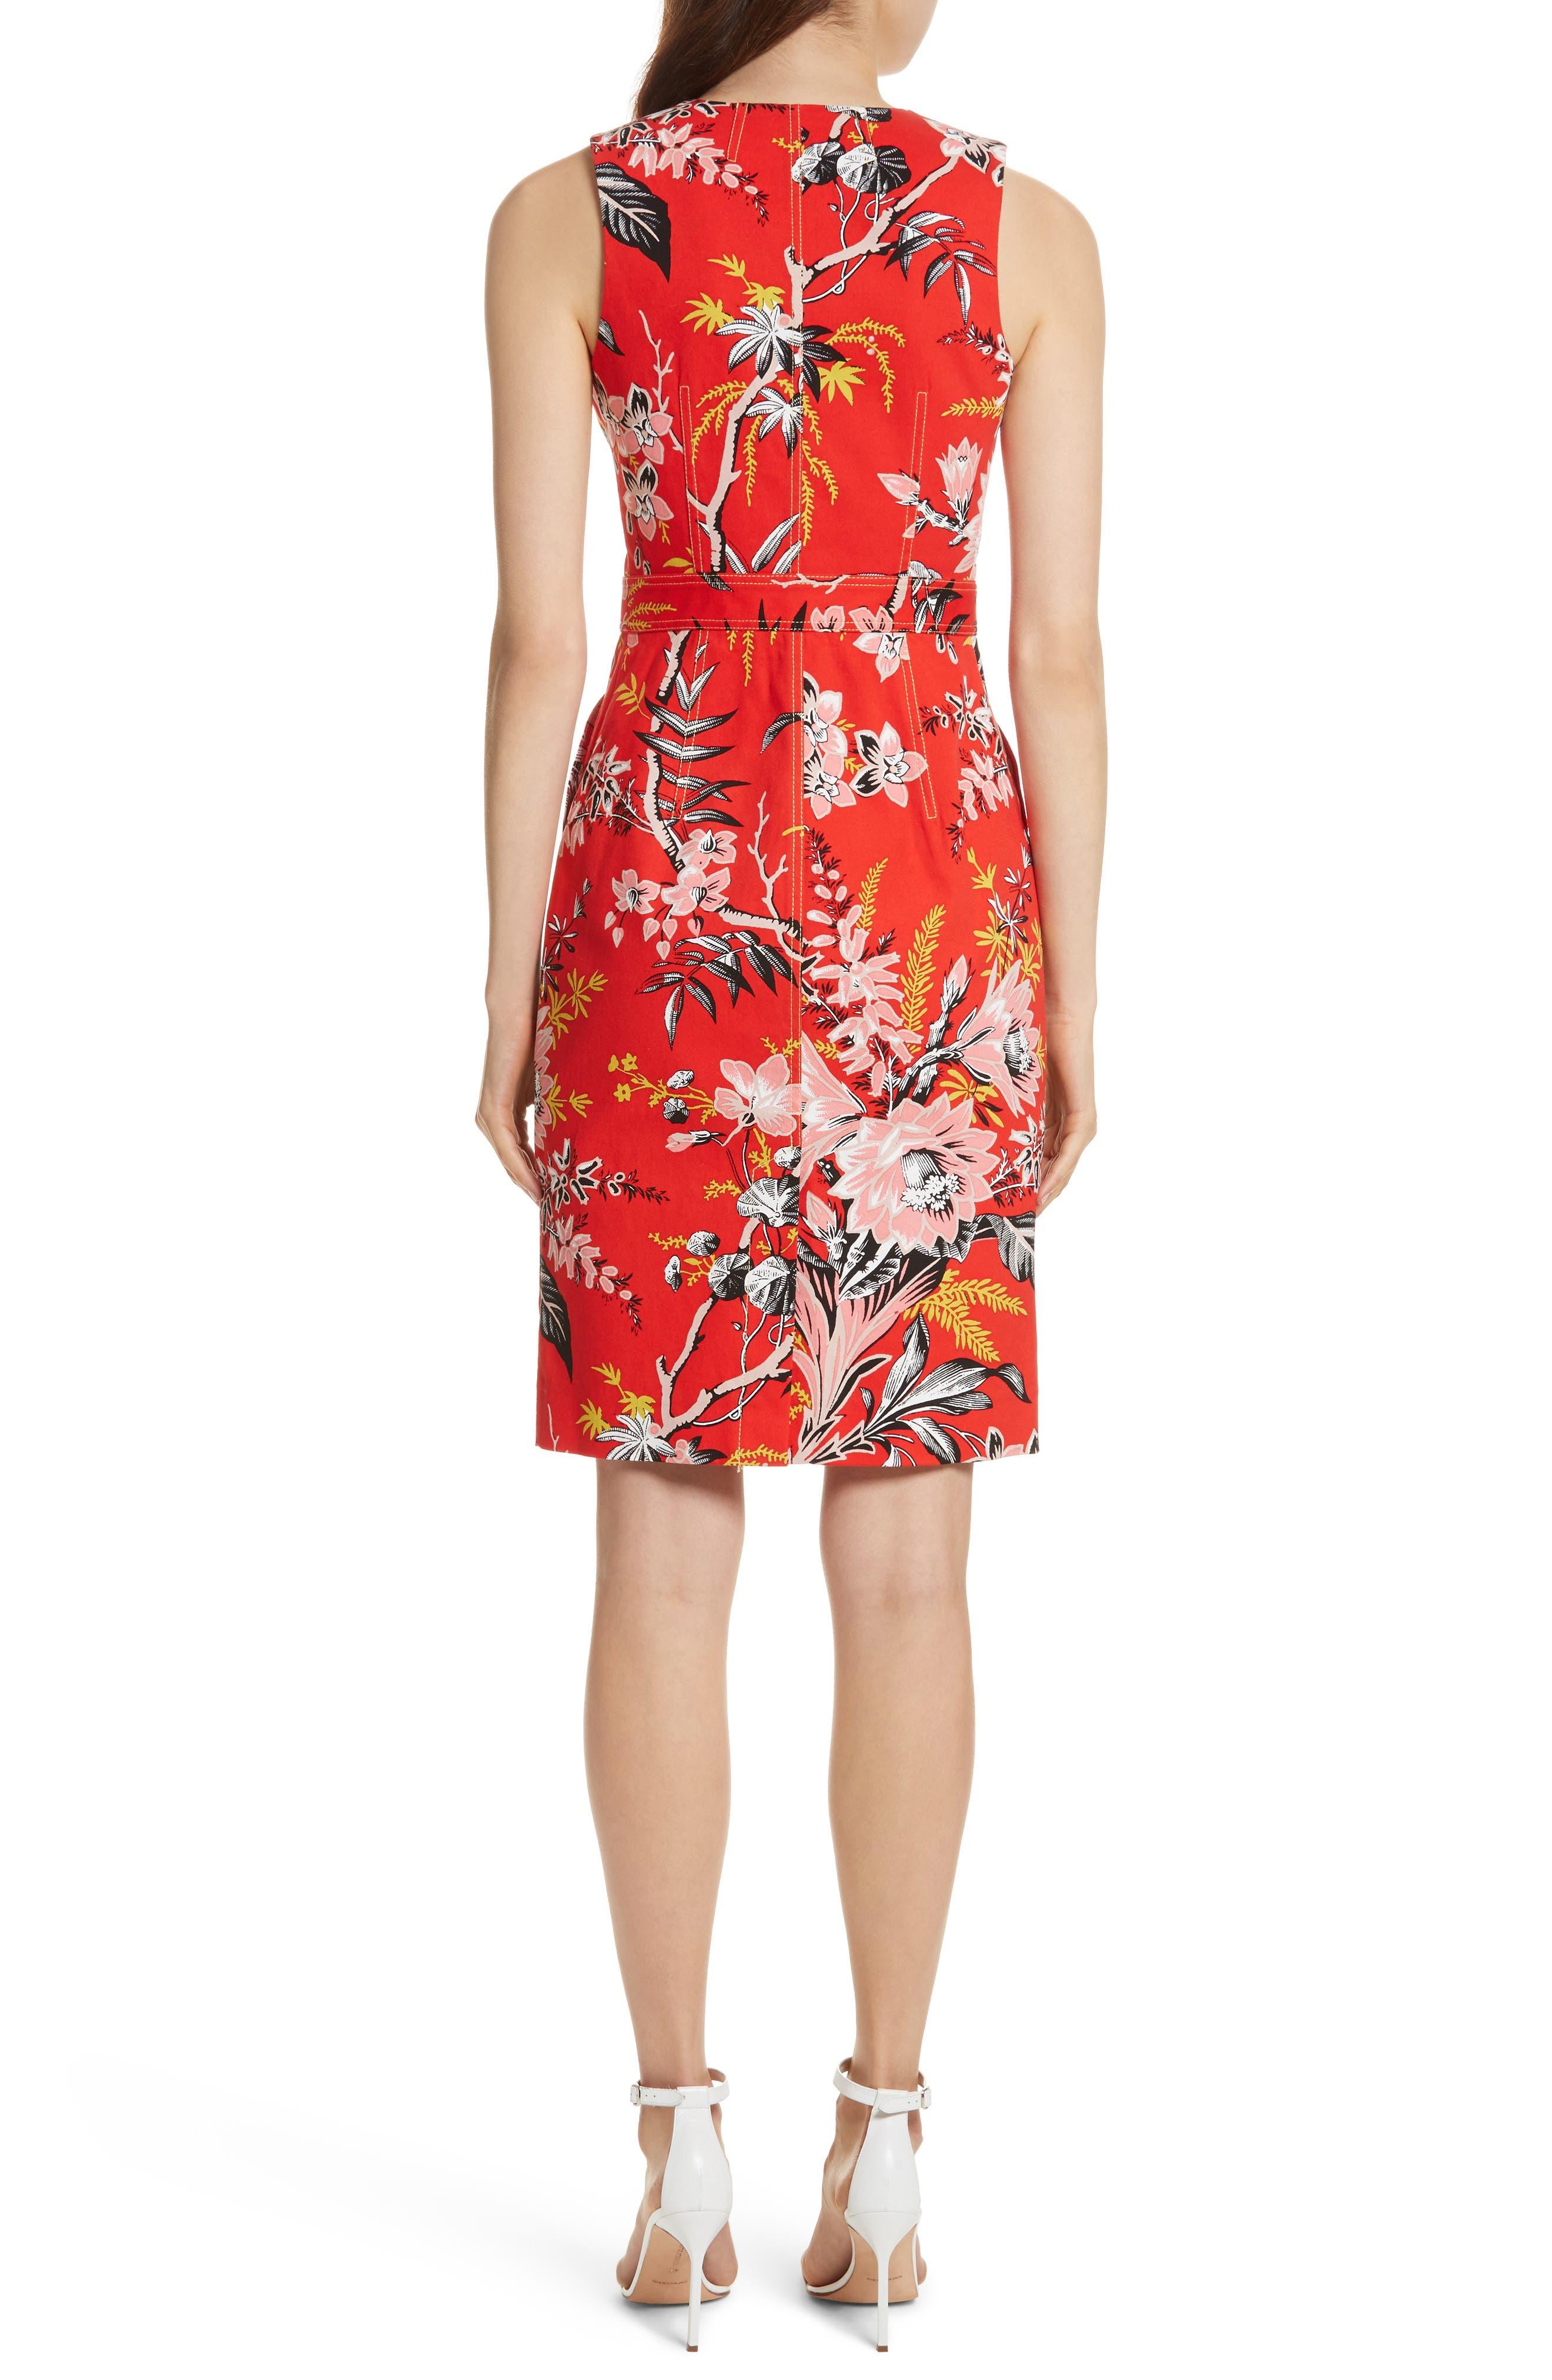 Diane von Furstenberg Floral Zip Front Stretch Cotton Sheath Dress,                             Alternate thumbnail 2, color,                             603